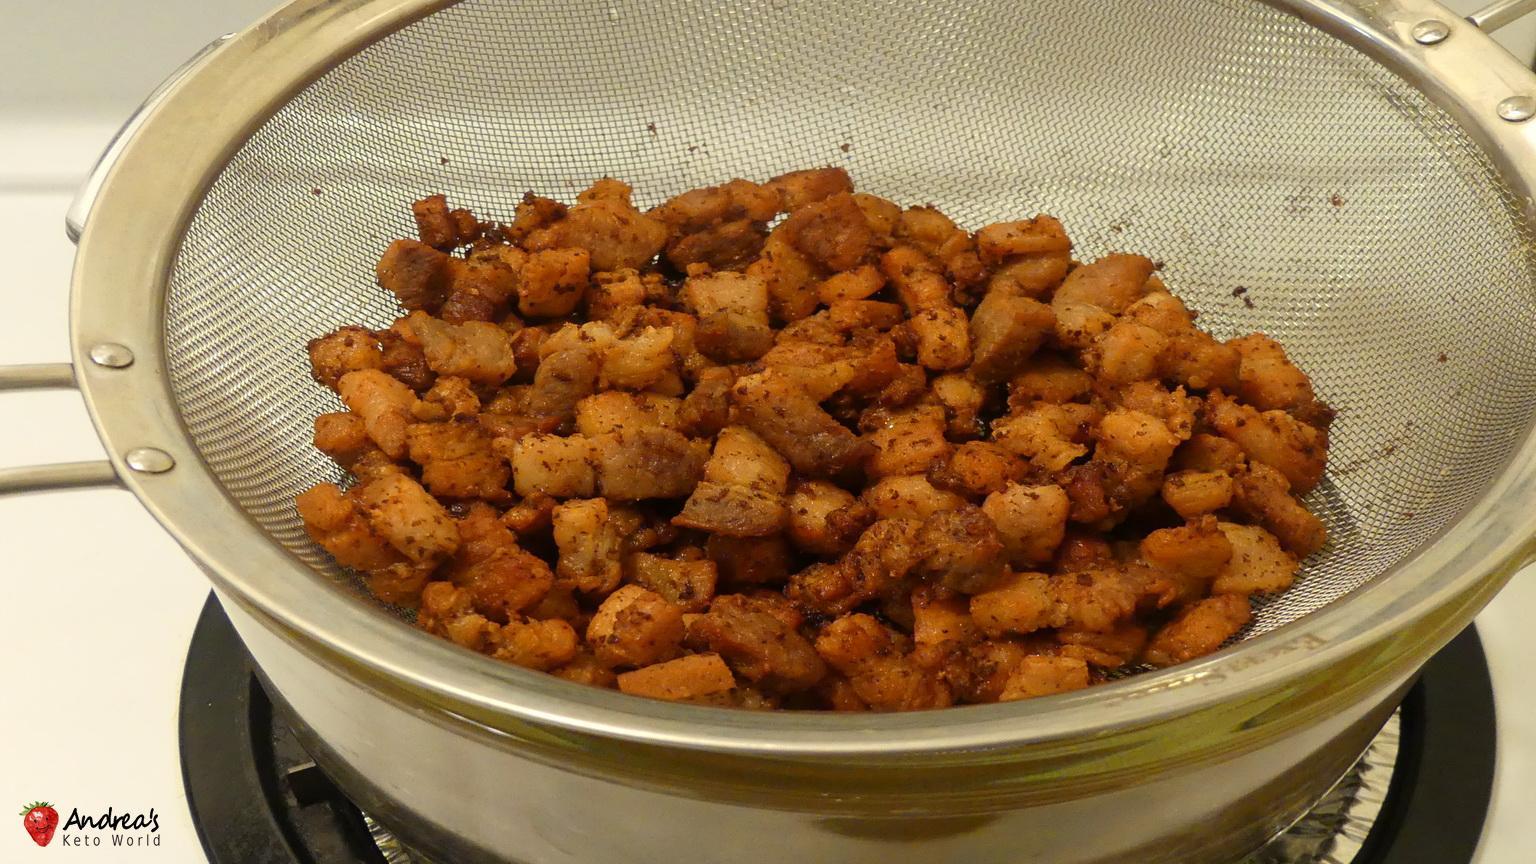 Homemade Keto Snack of Crispy Pork Crackling Bites